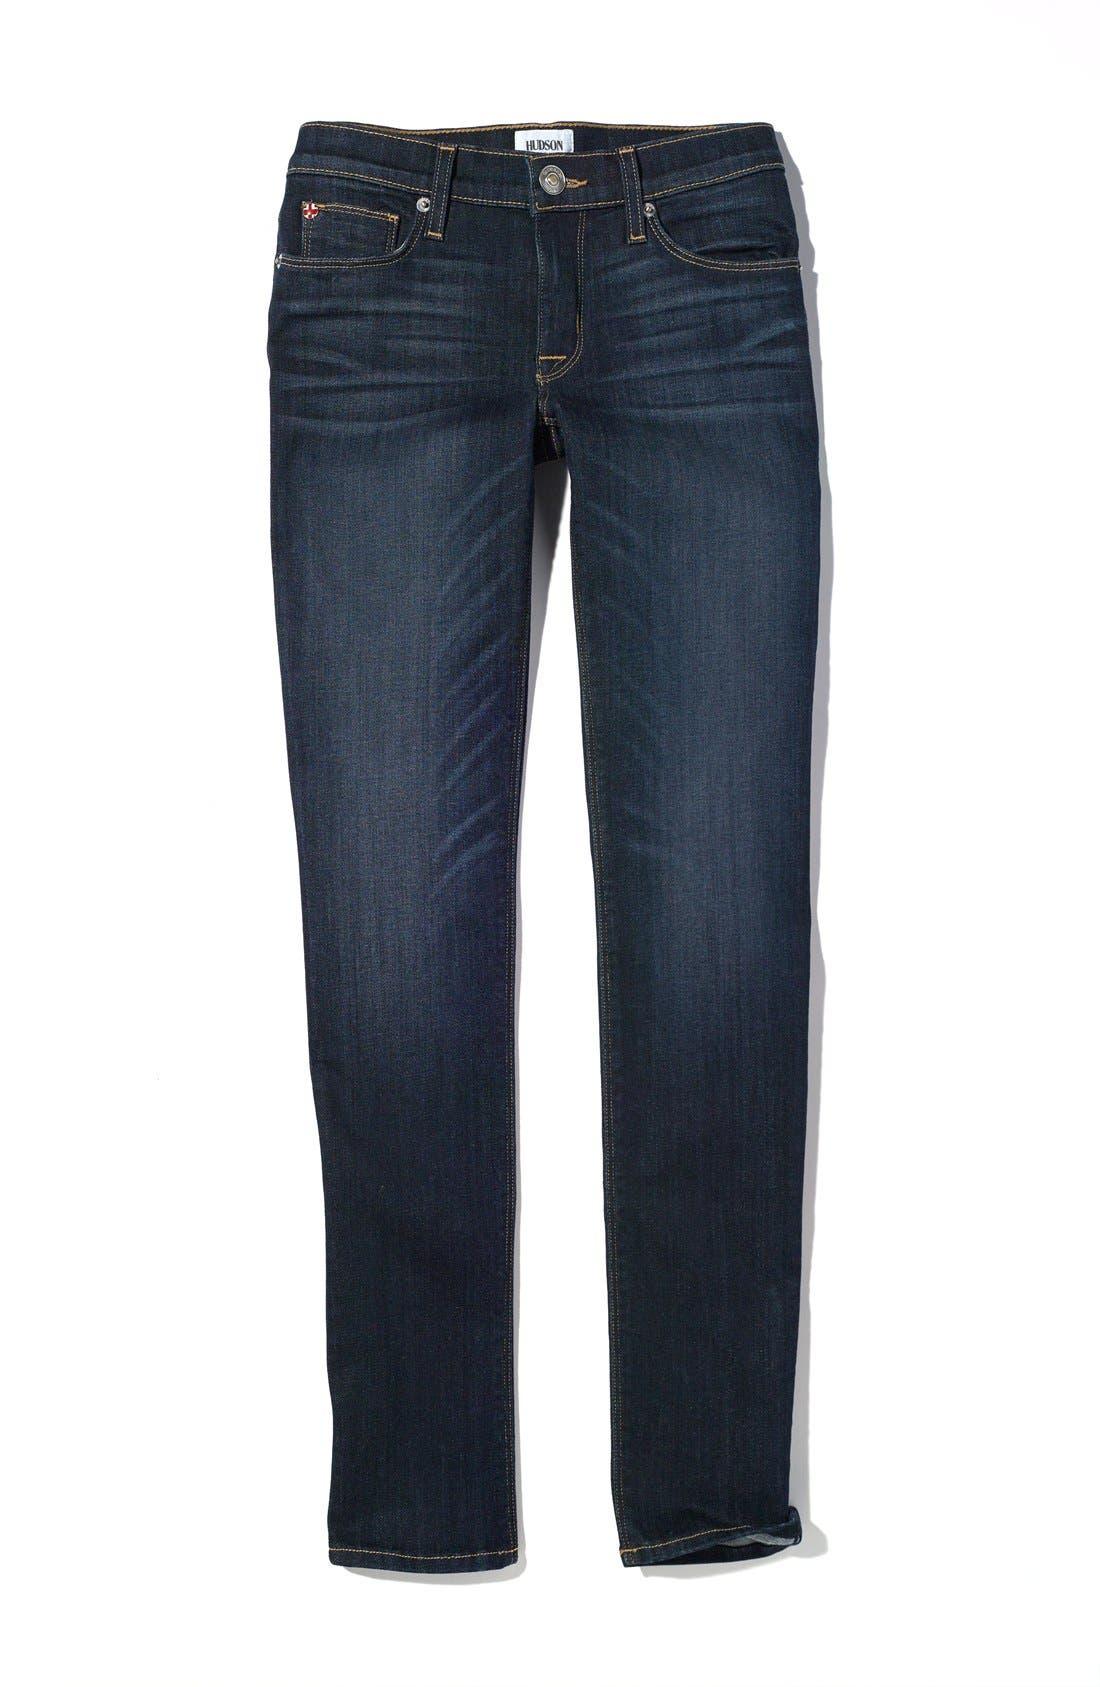 Alternate Image 4  - Hudson Jeans 'Collette' Skinny Jeans (Stella)